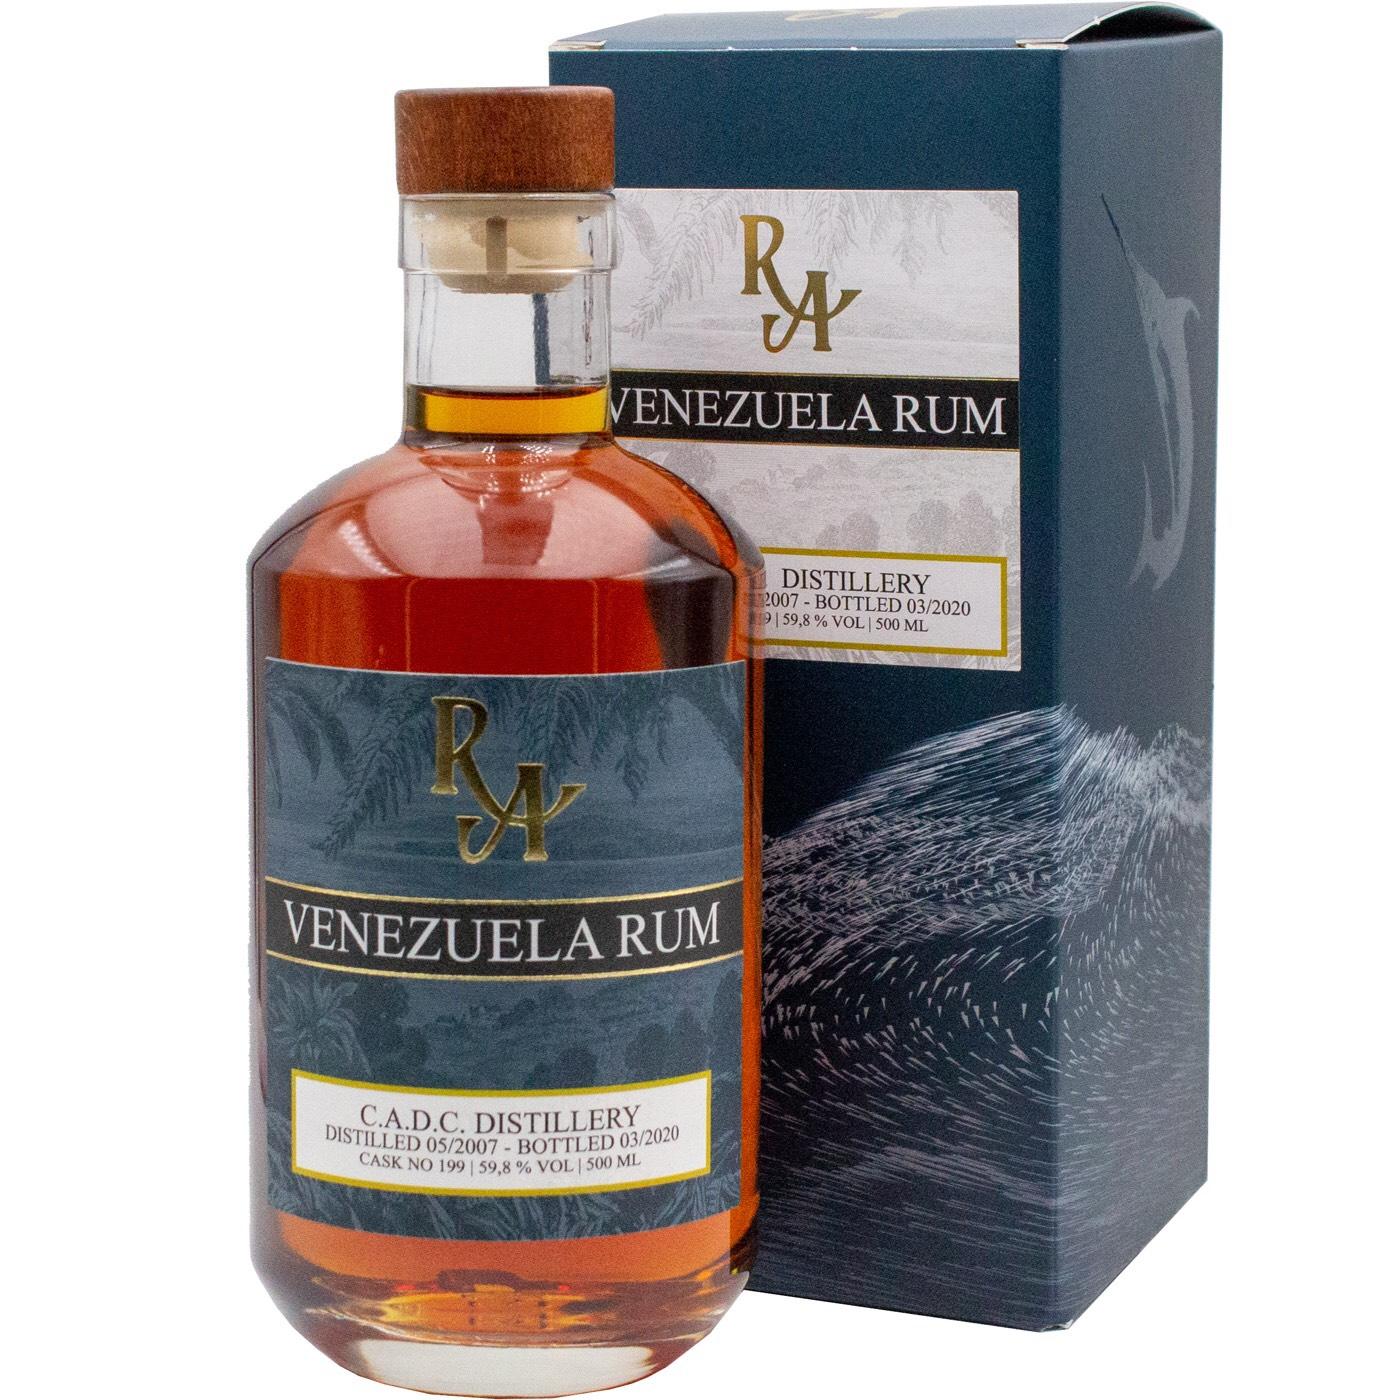 Bottle image of Rum Artesanal Venezuela Rum